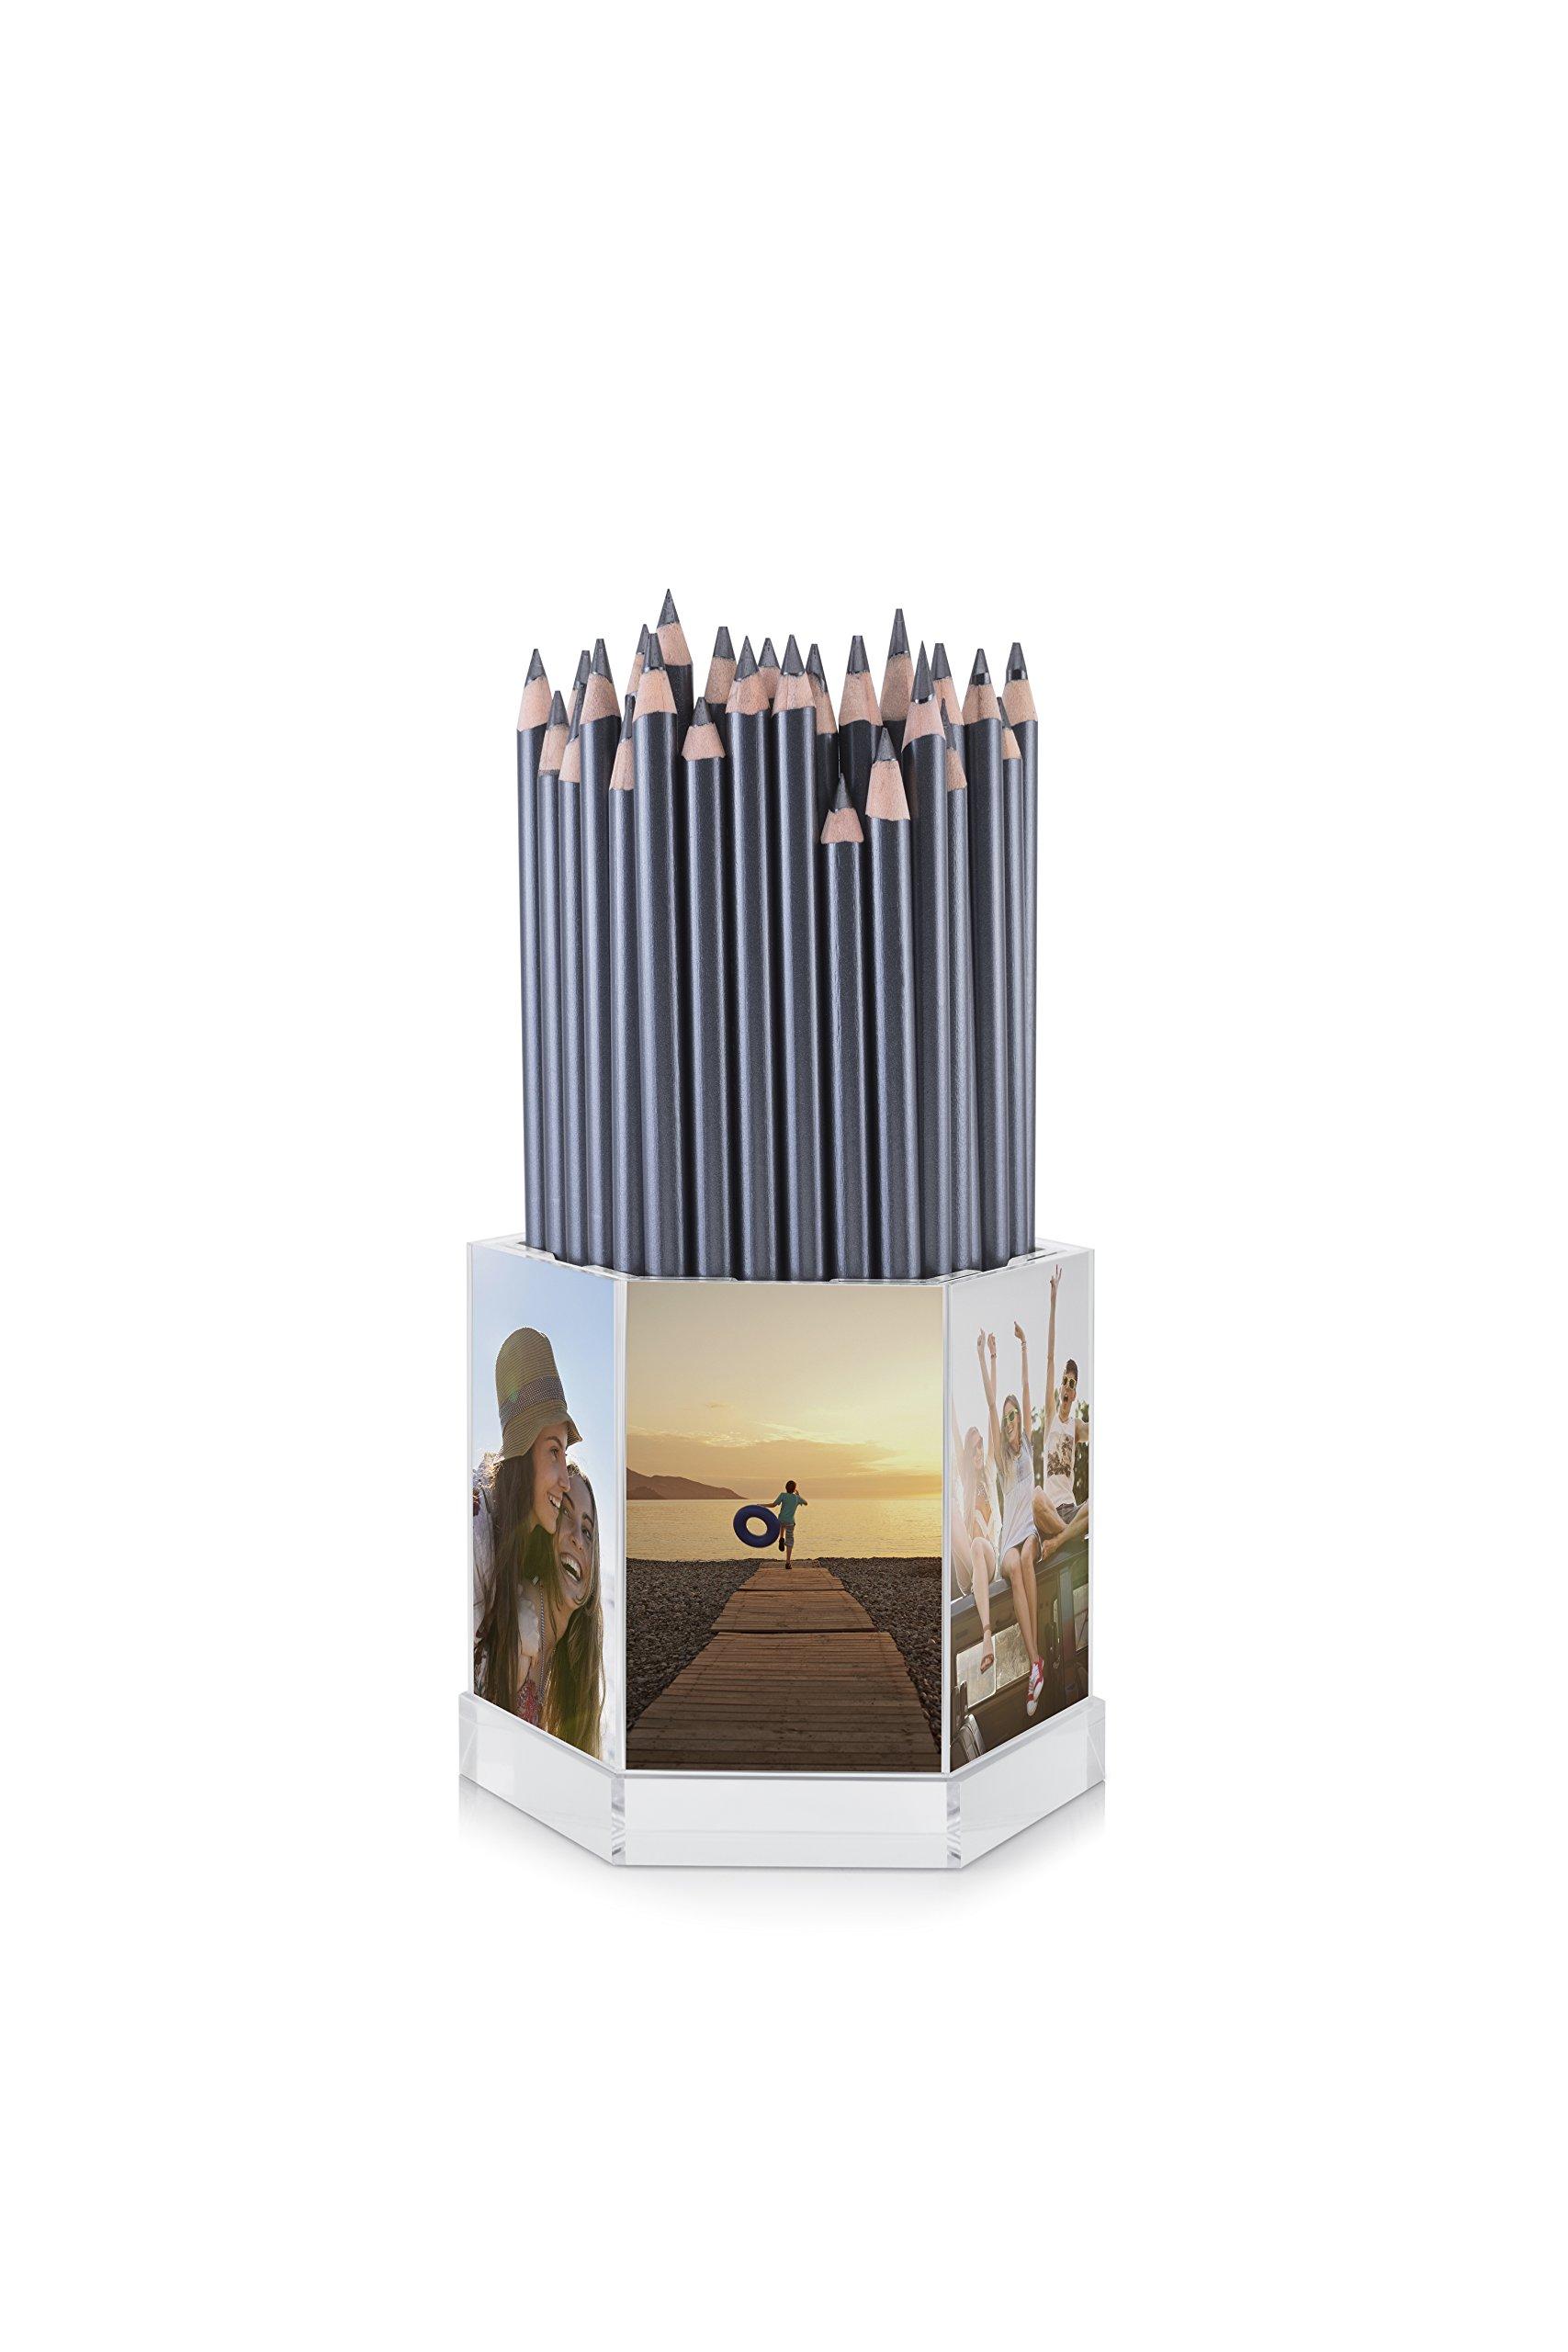 HP Sprocket Pen Caddy Photo Display (2HS28A)